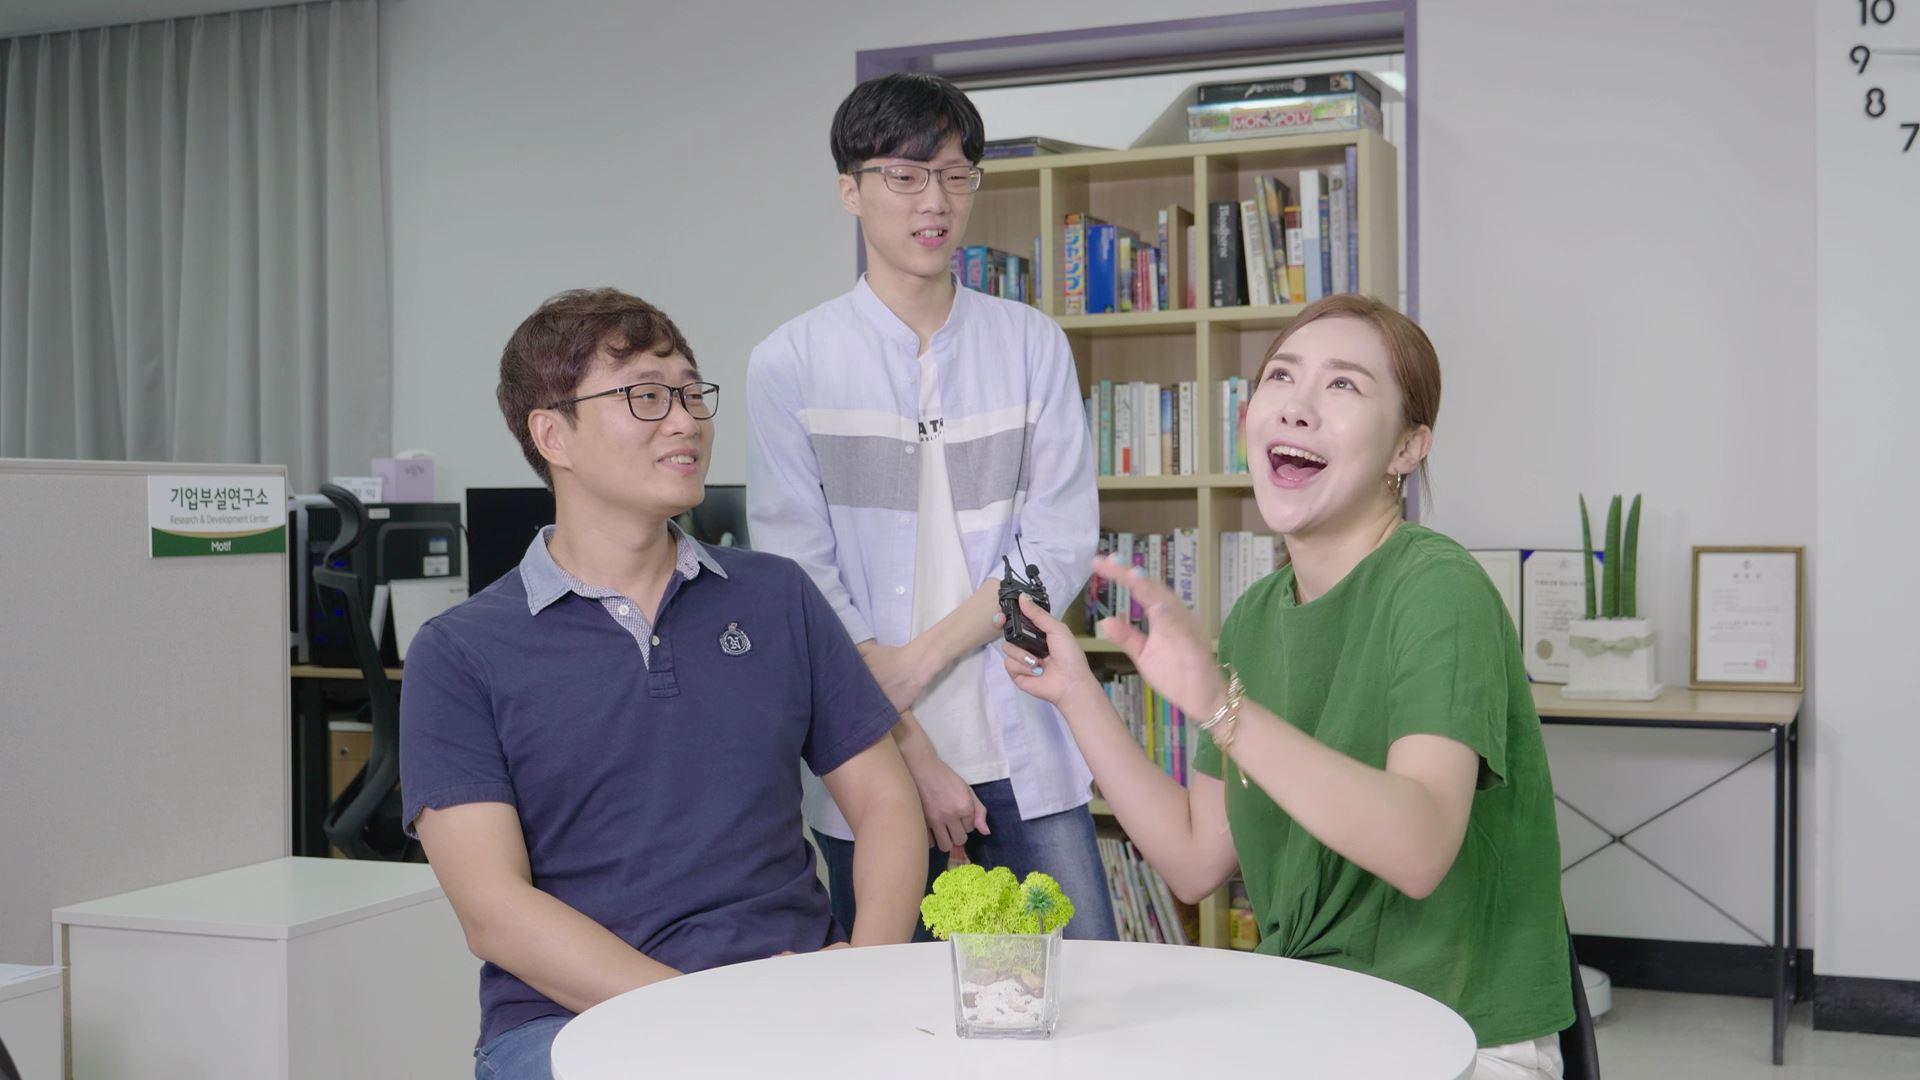 Motif X sba 채용꿀팁 동영상